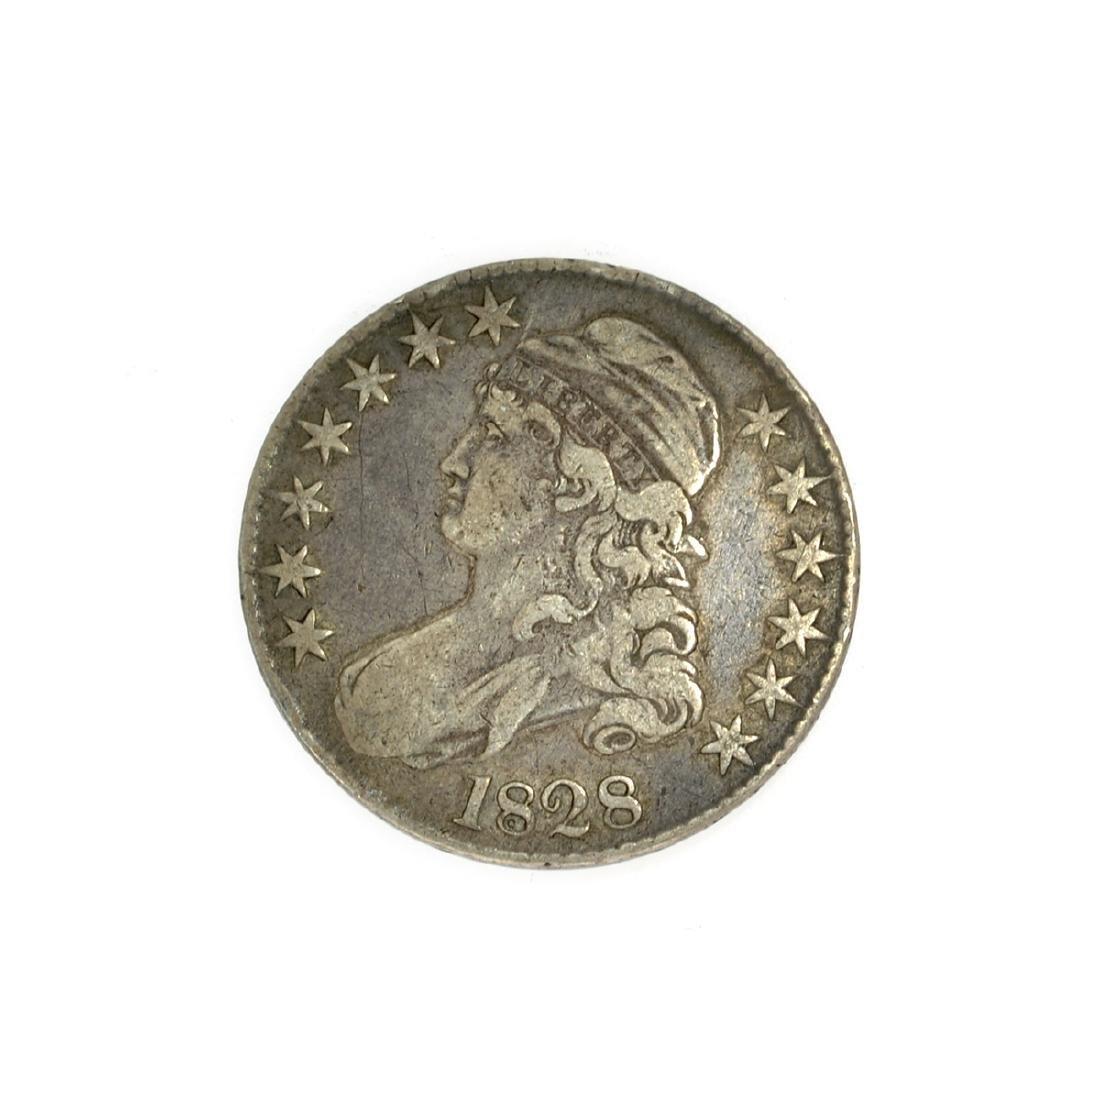 Rare 1828 Capped Bust Half Dollar Coin